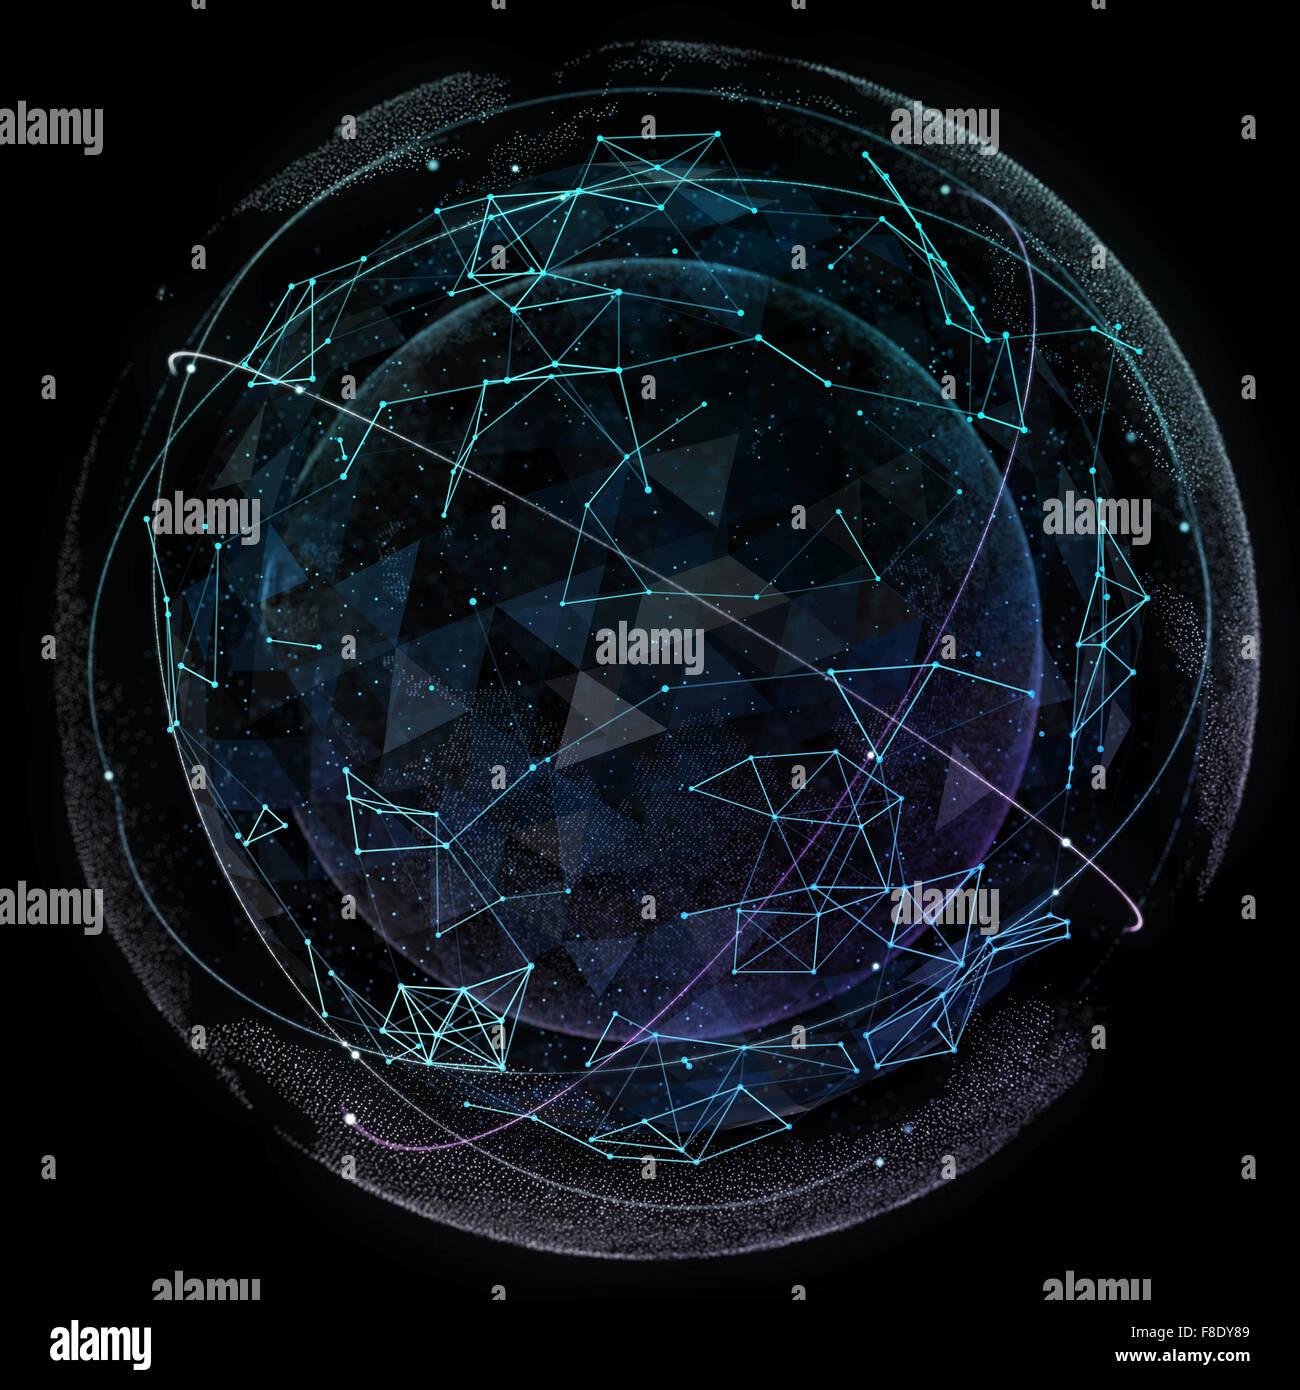 Global network internet technologies digital world map stock photo global network internet technologies digital world map gumiabroncs Images